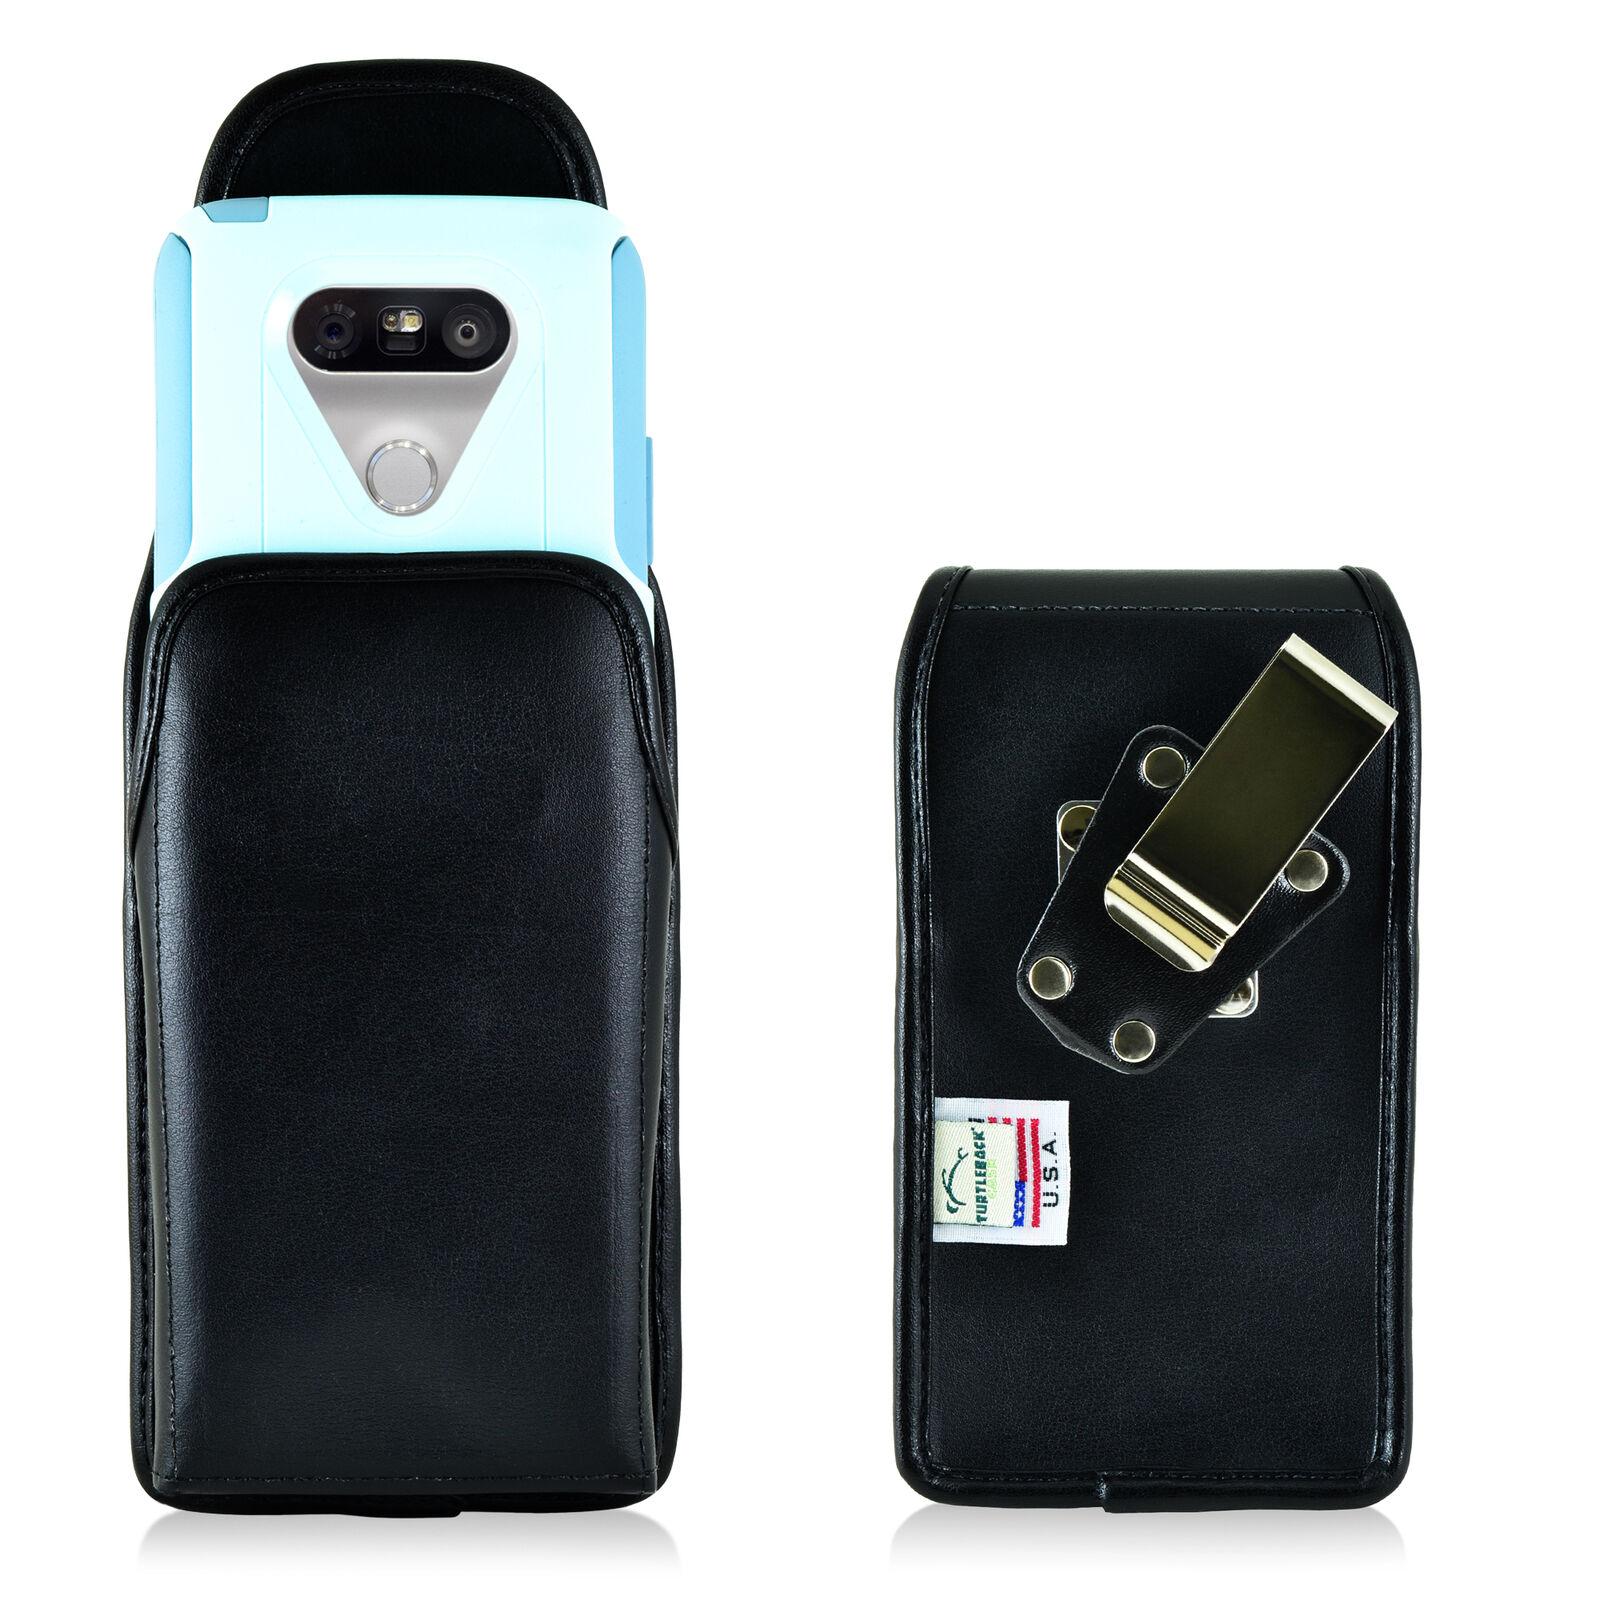 turtleback-lg-g5-vertical-leather-holster-case-metal-clip-for-otterbox-commuter